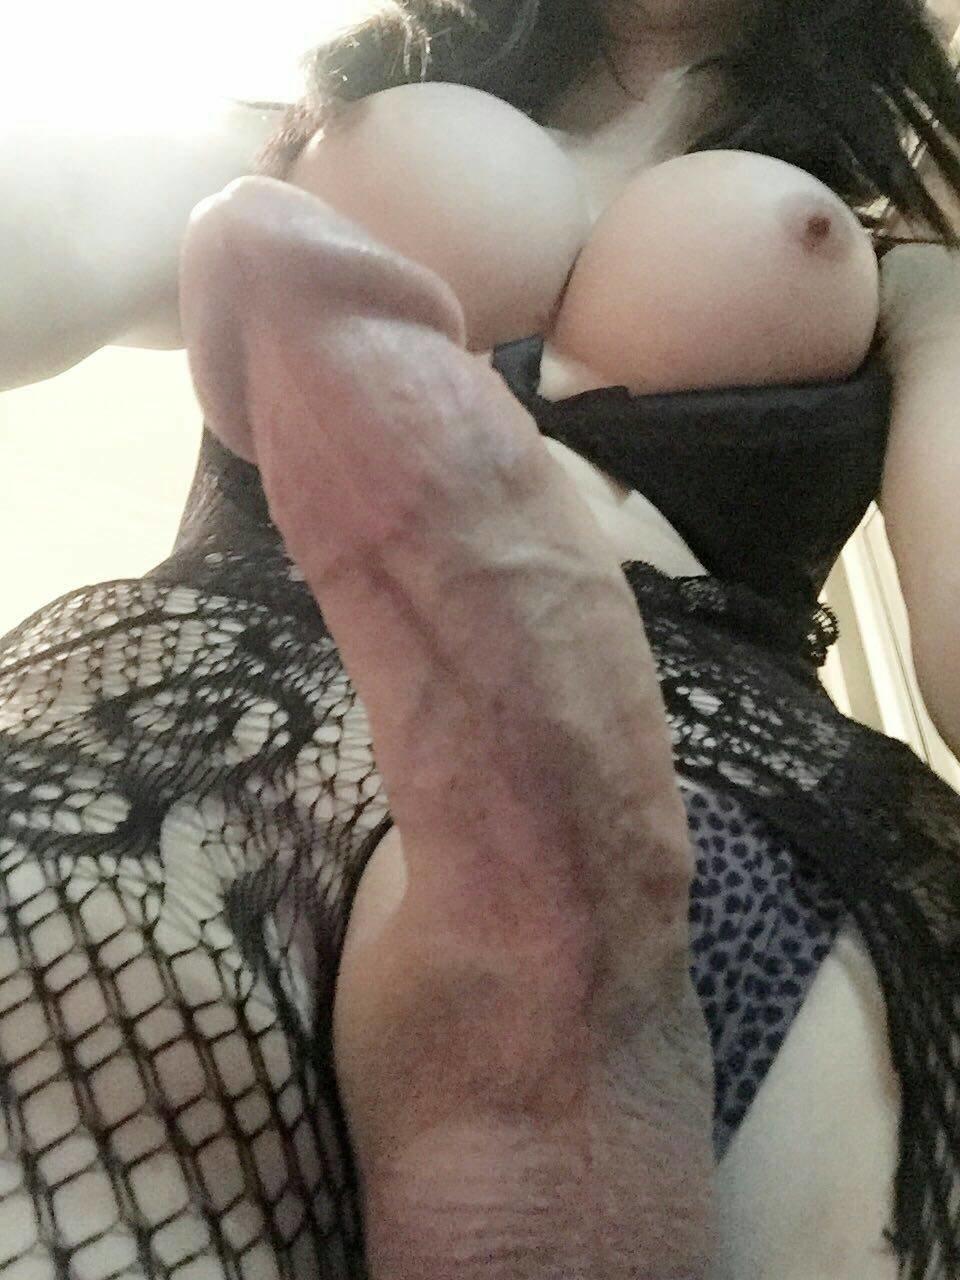 ae84afc06 Verified photos XXL bothاني نانسي شيميل عربيه في اسطنبول - Transsexual ...